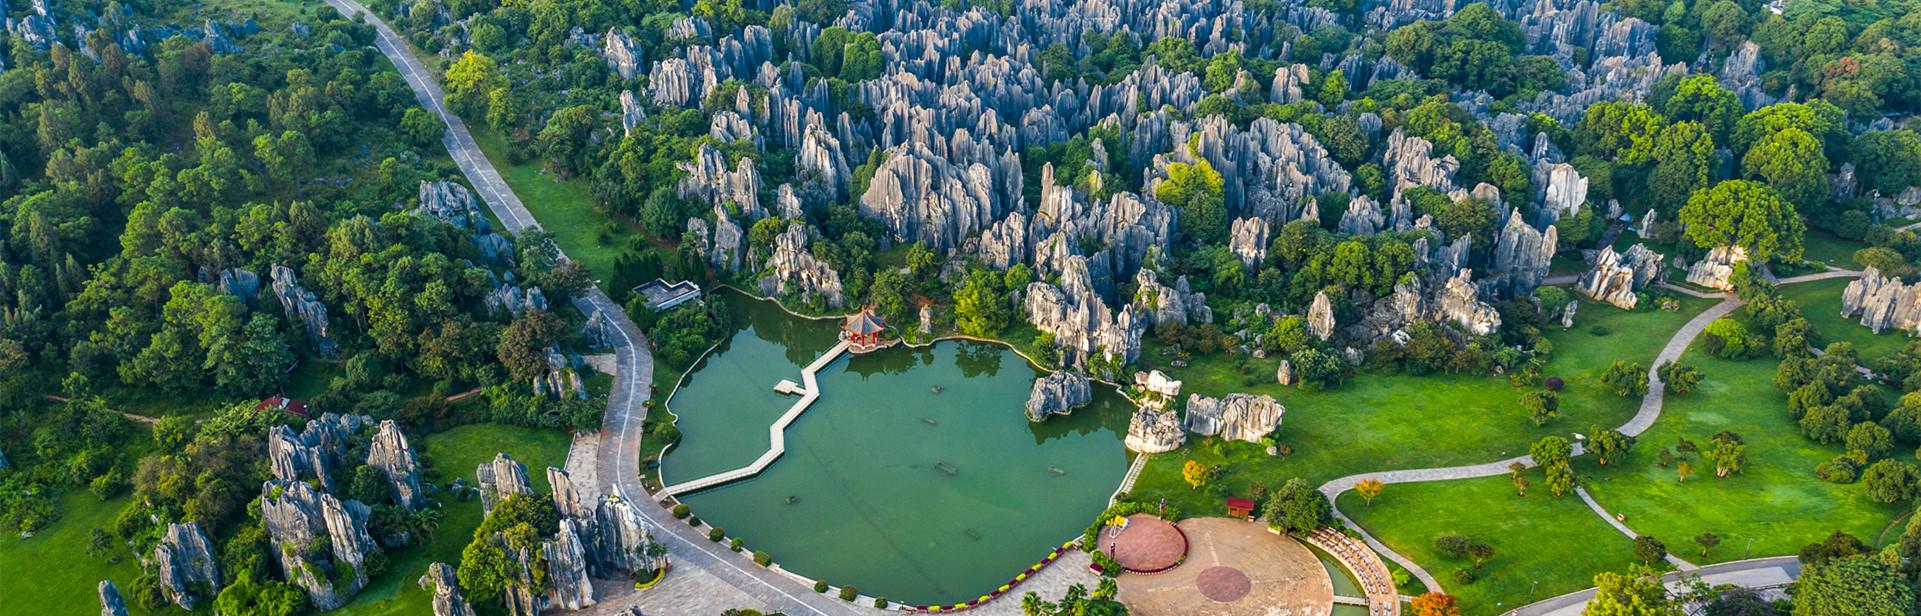 A bird's-eye view of Kunming city_副本.jpg